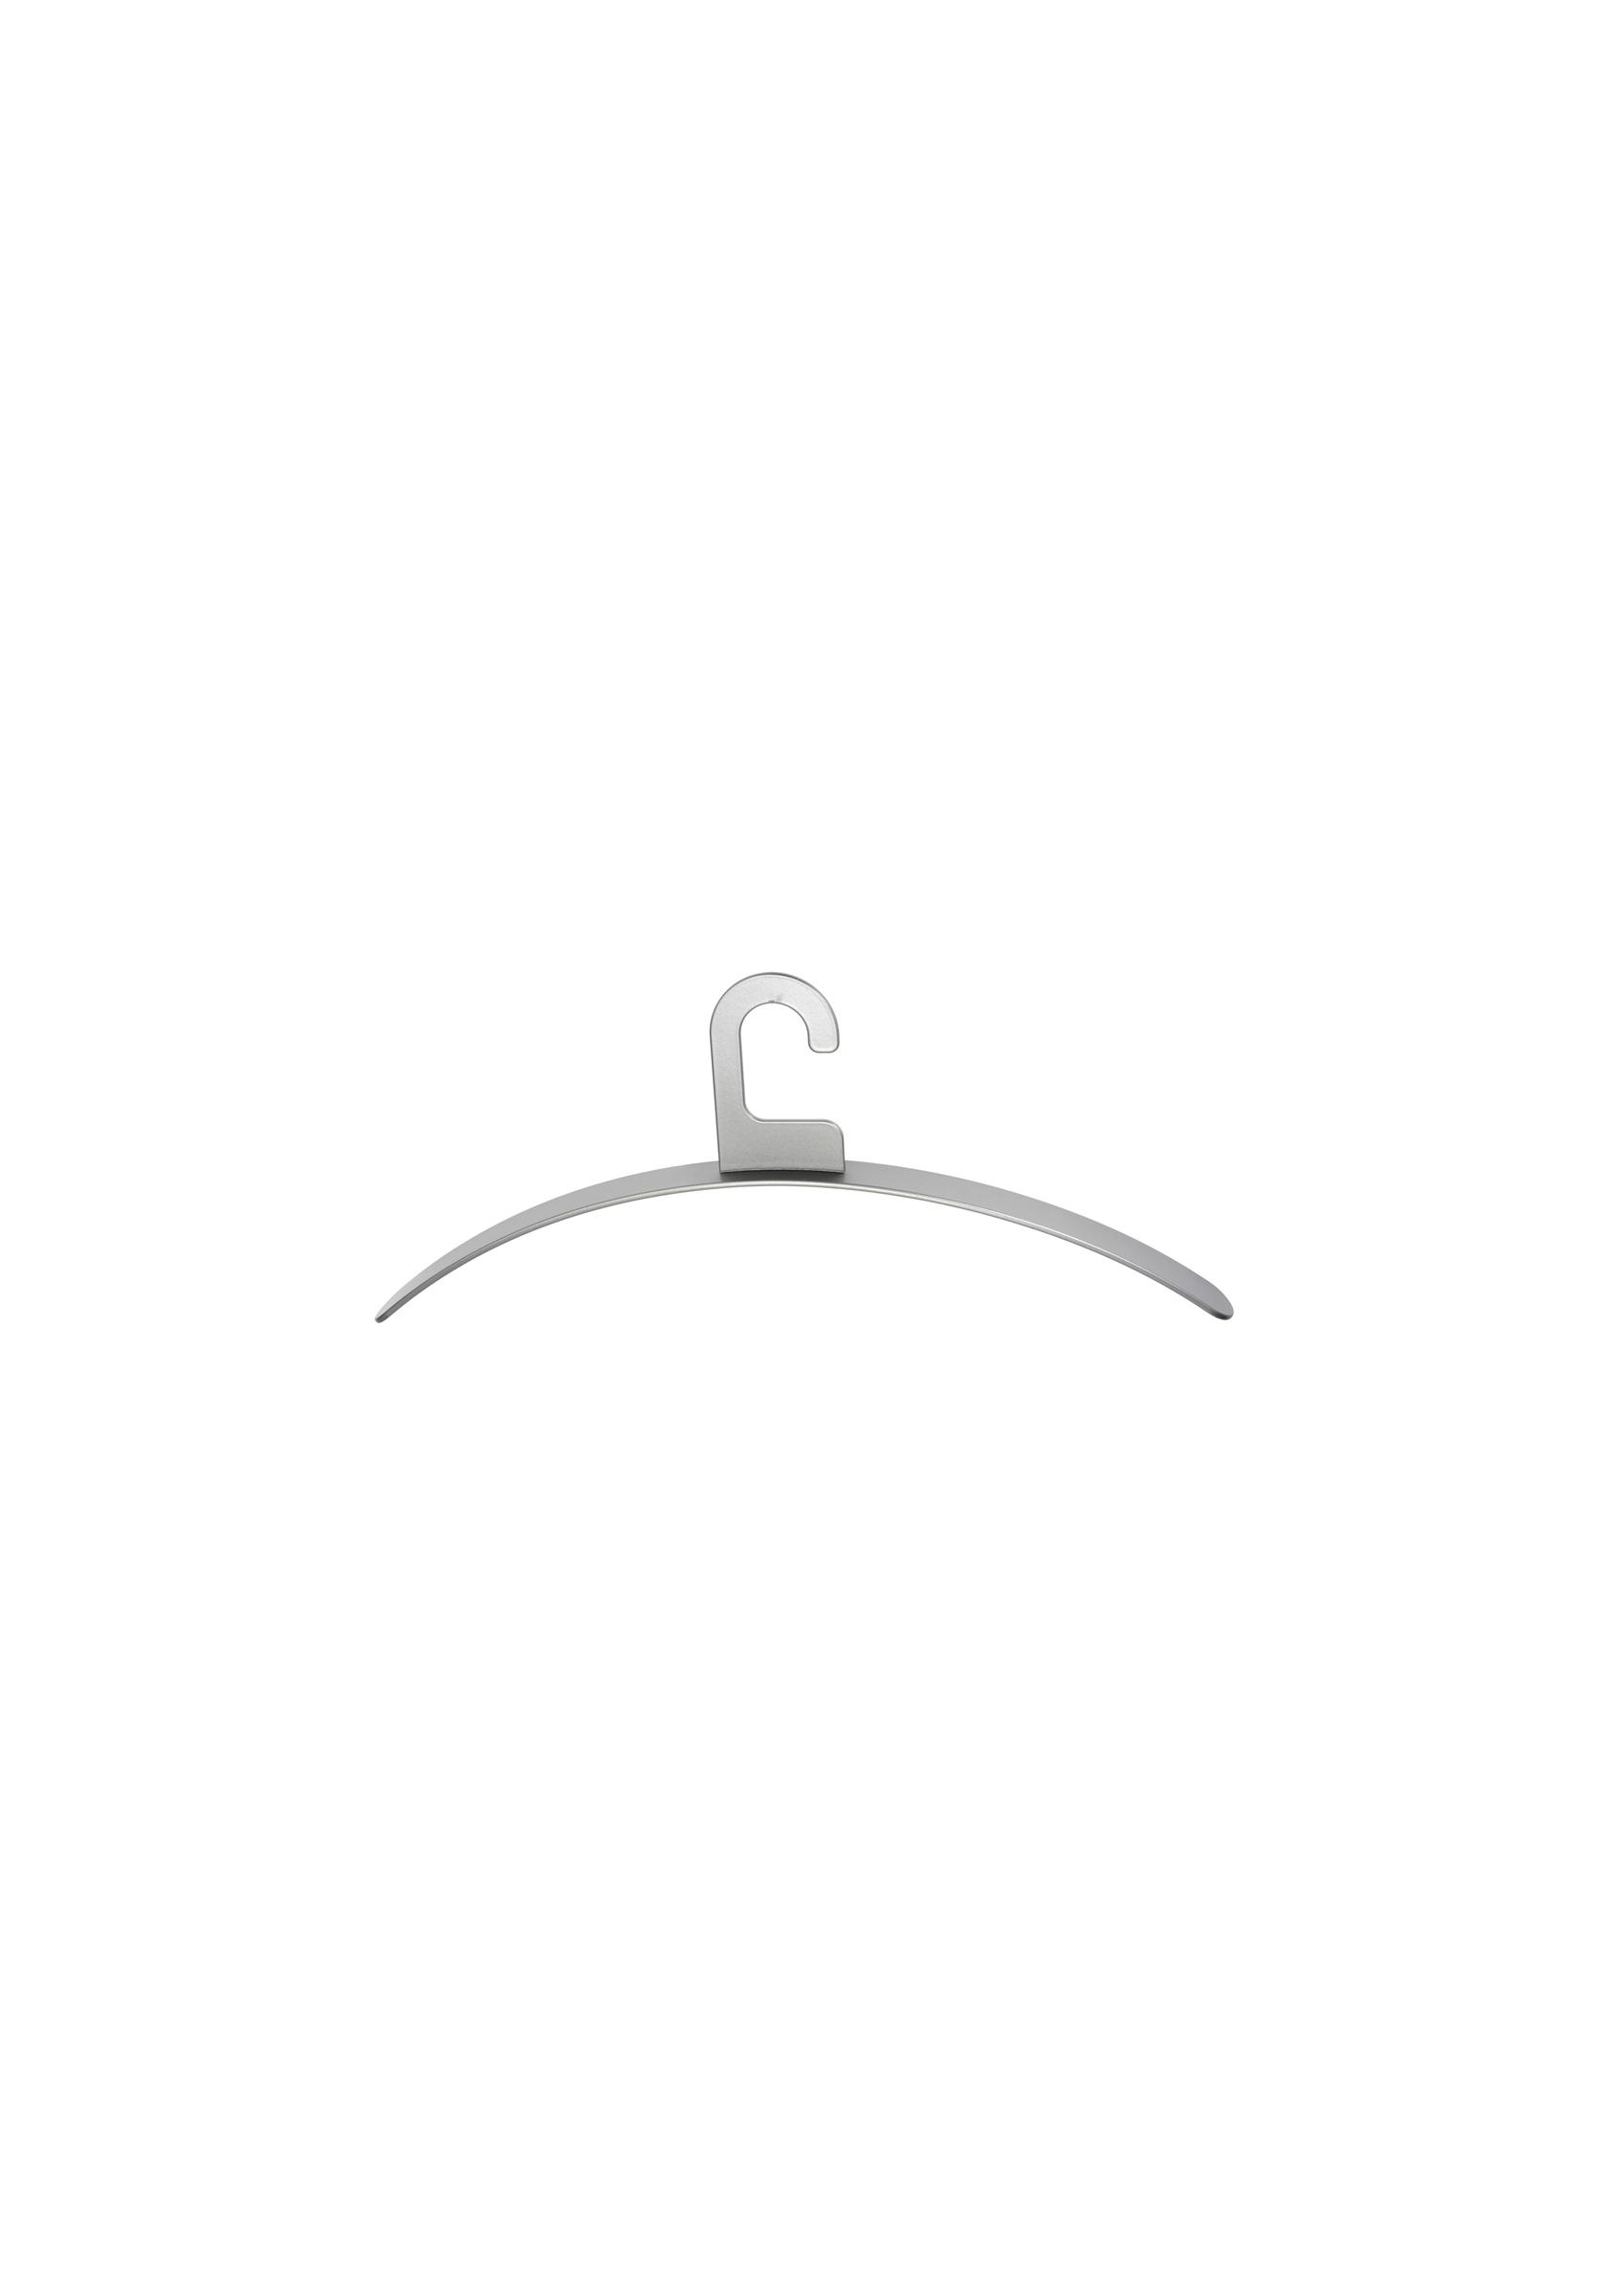 10 Stück PVC Zugentlastung Kabelknickschutz Kabelschutz 54mm Länge Schwarz